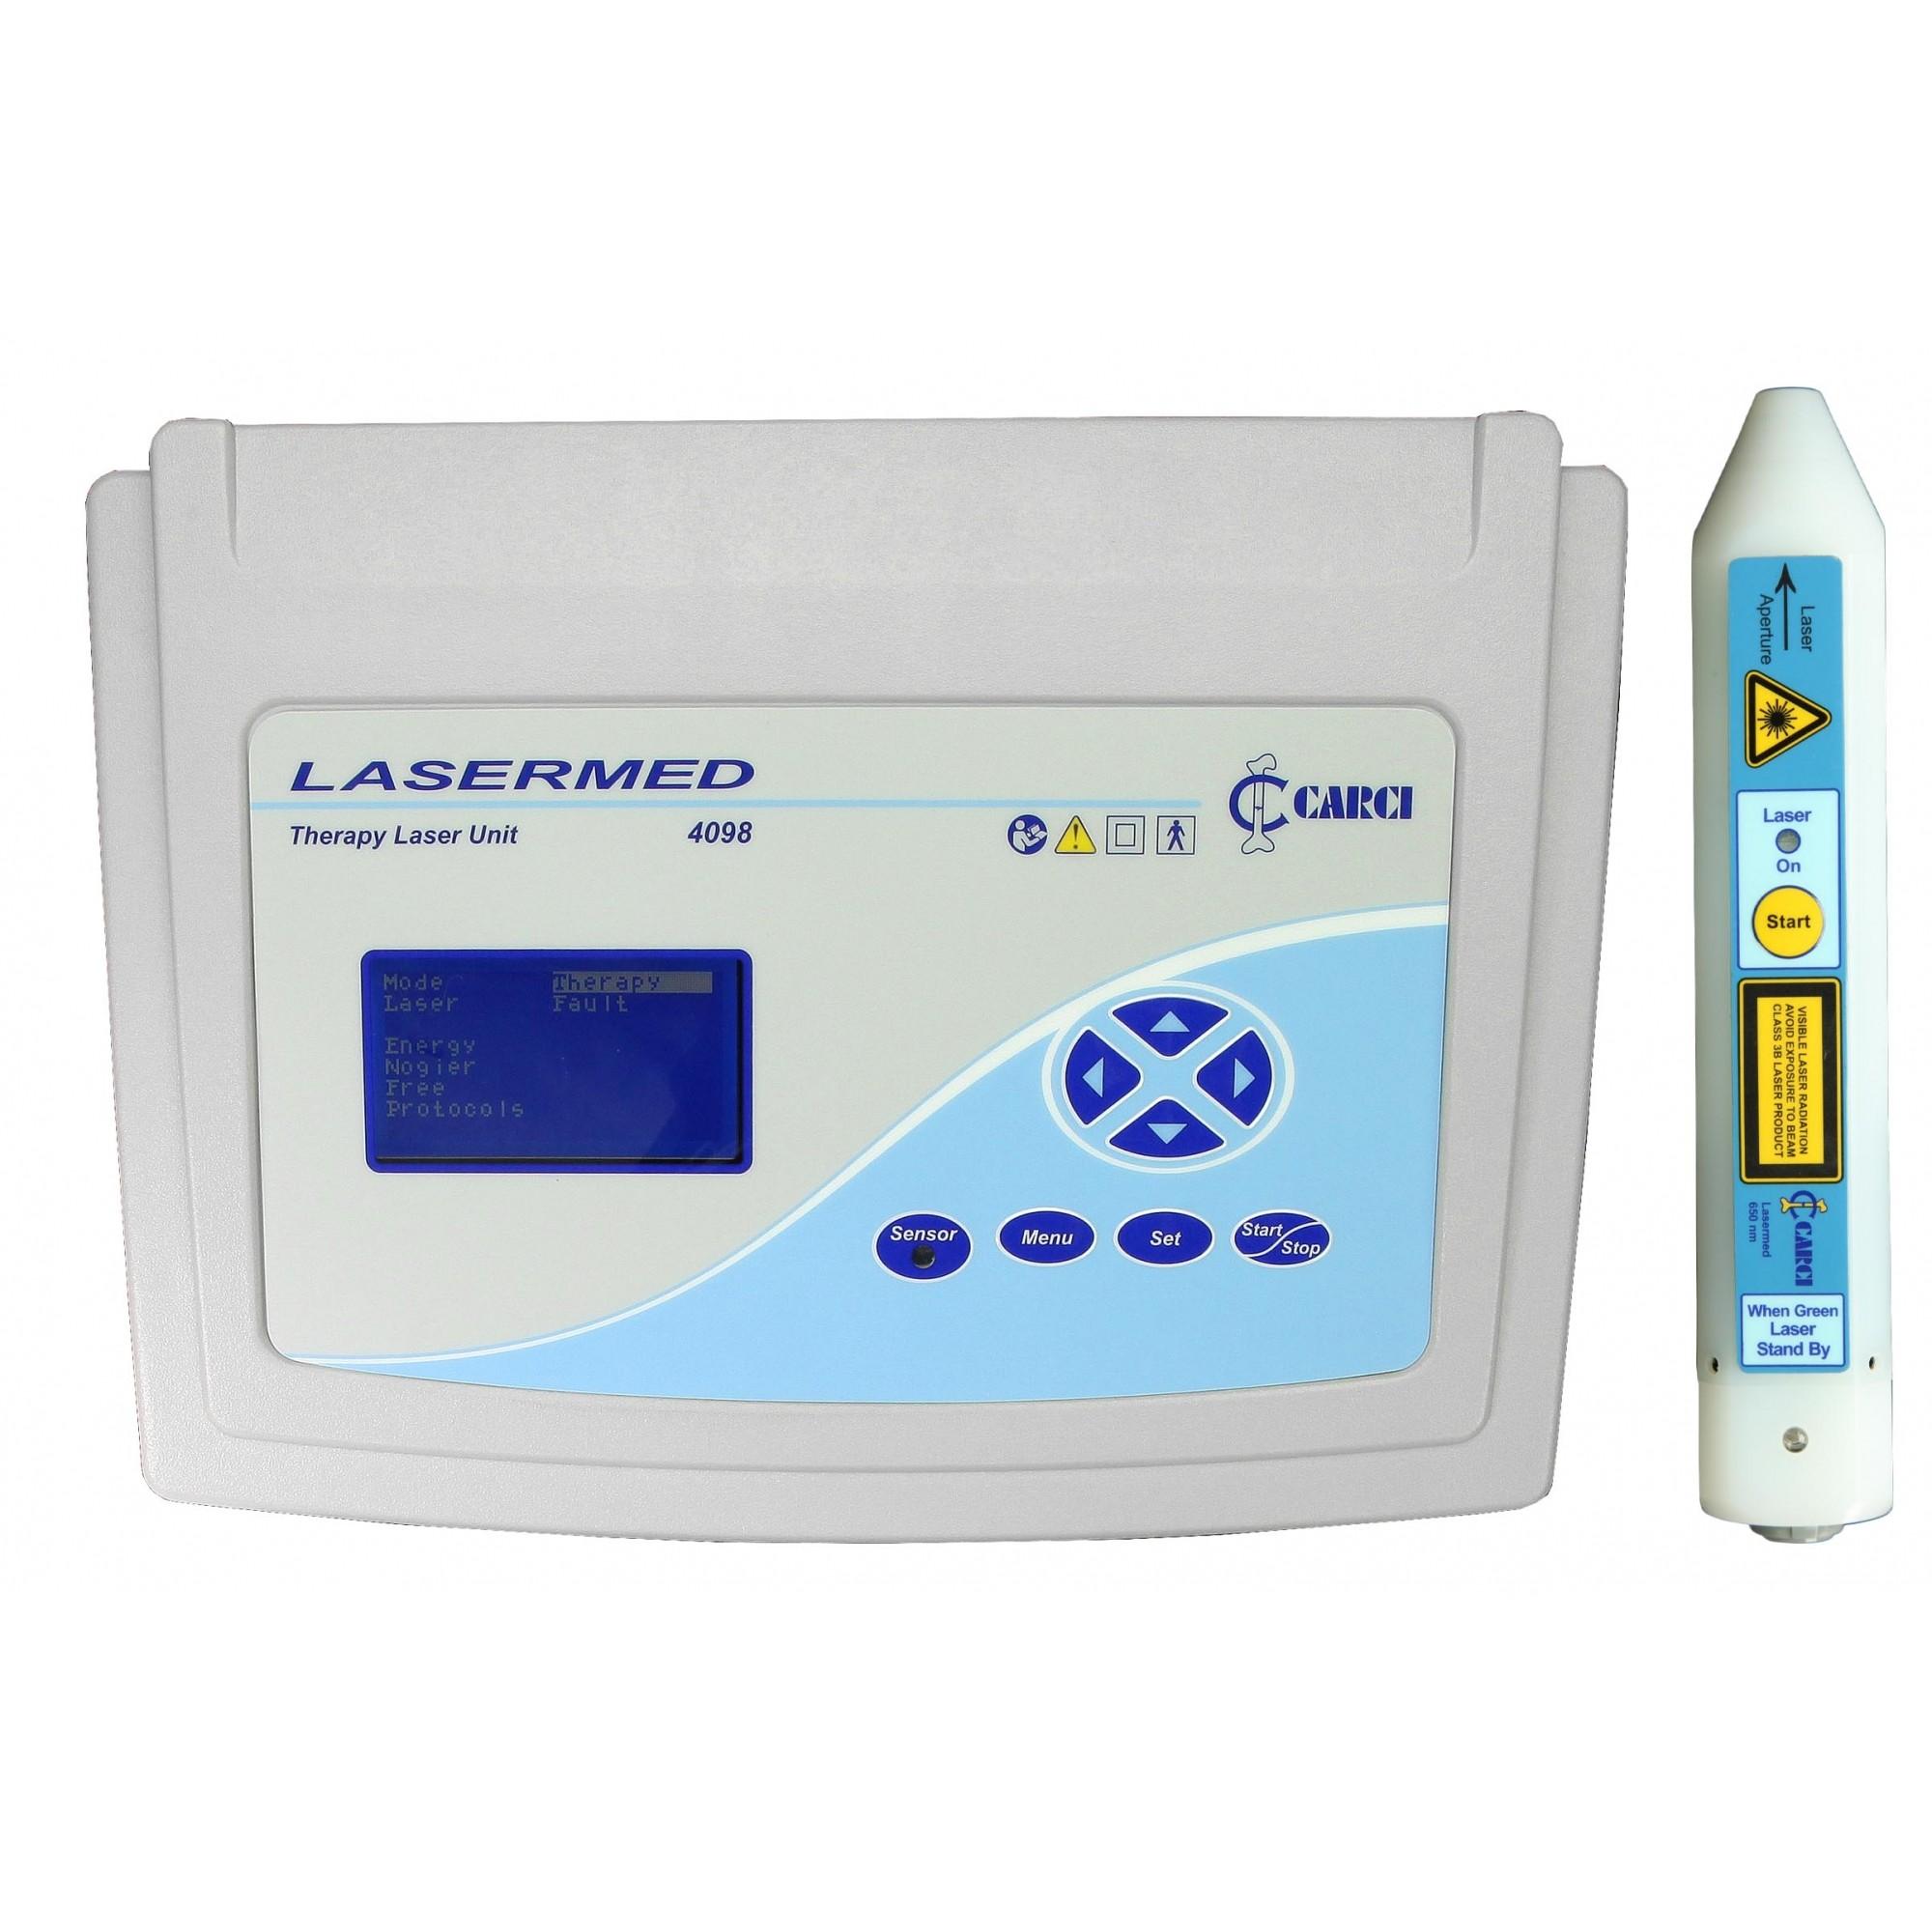 Laser para fisioterapia e caneta 650 nm - 4098+4095